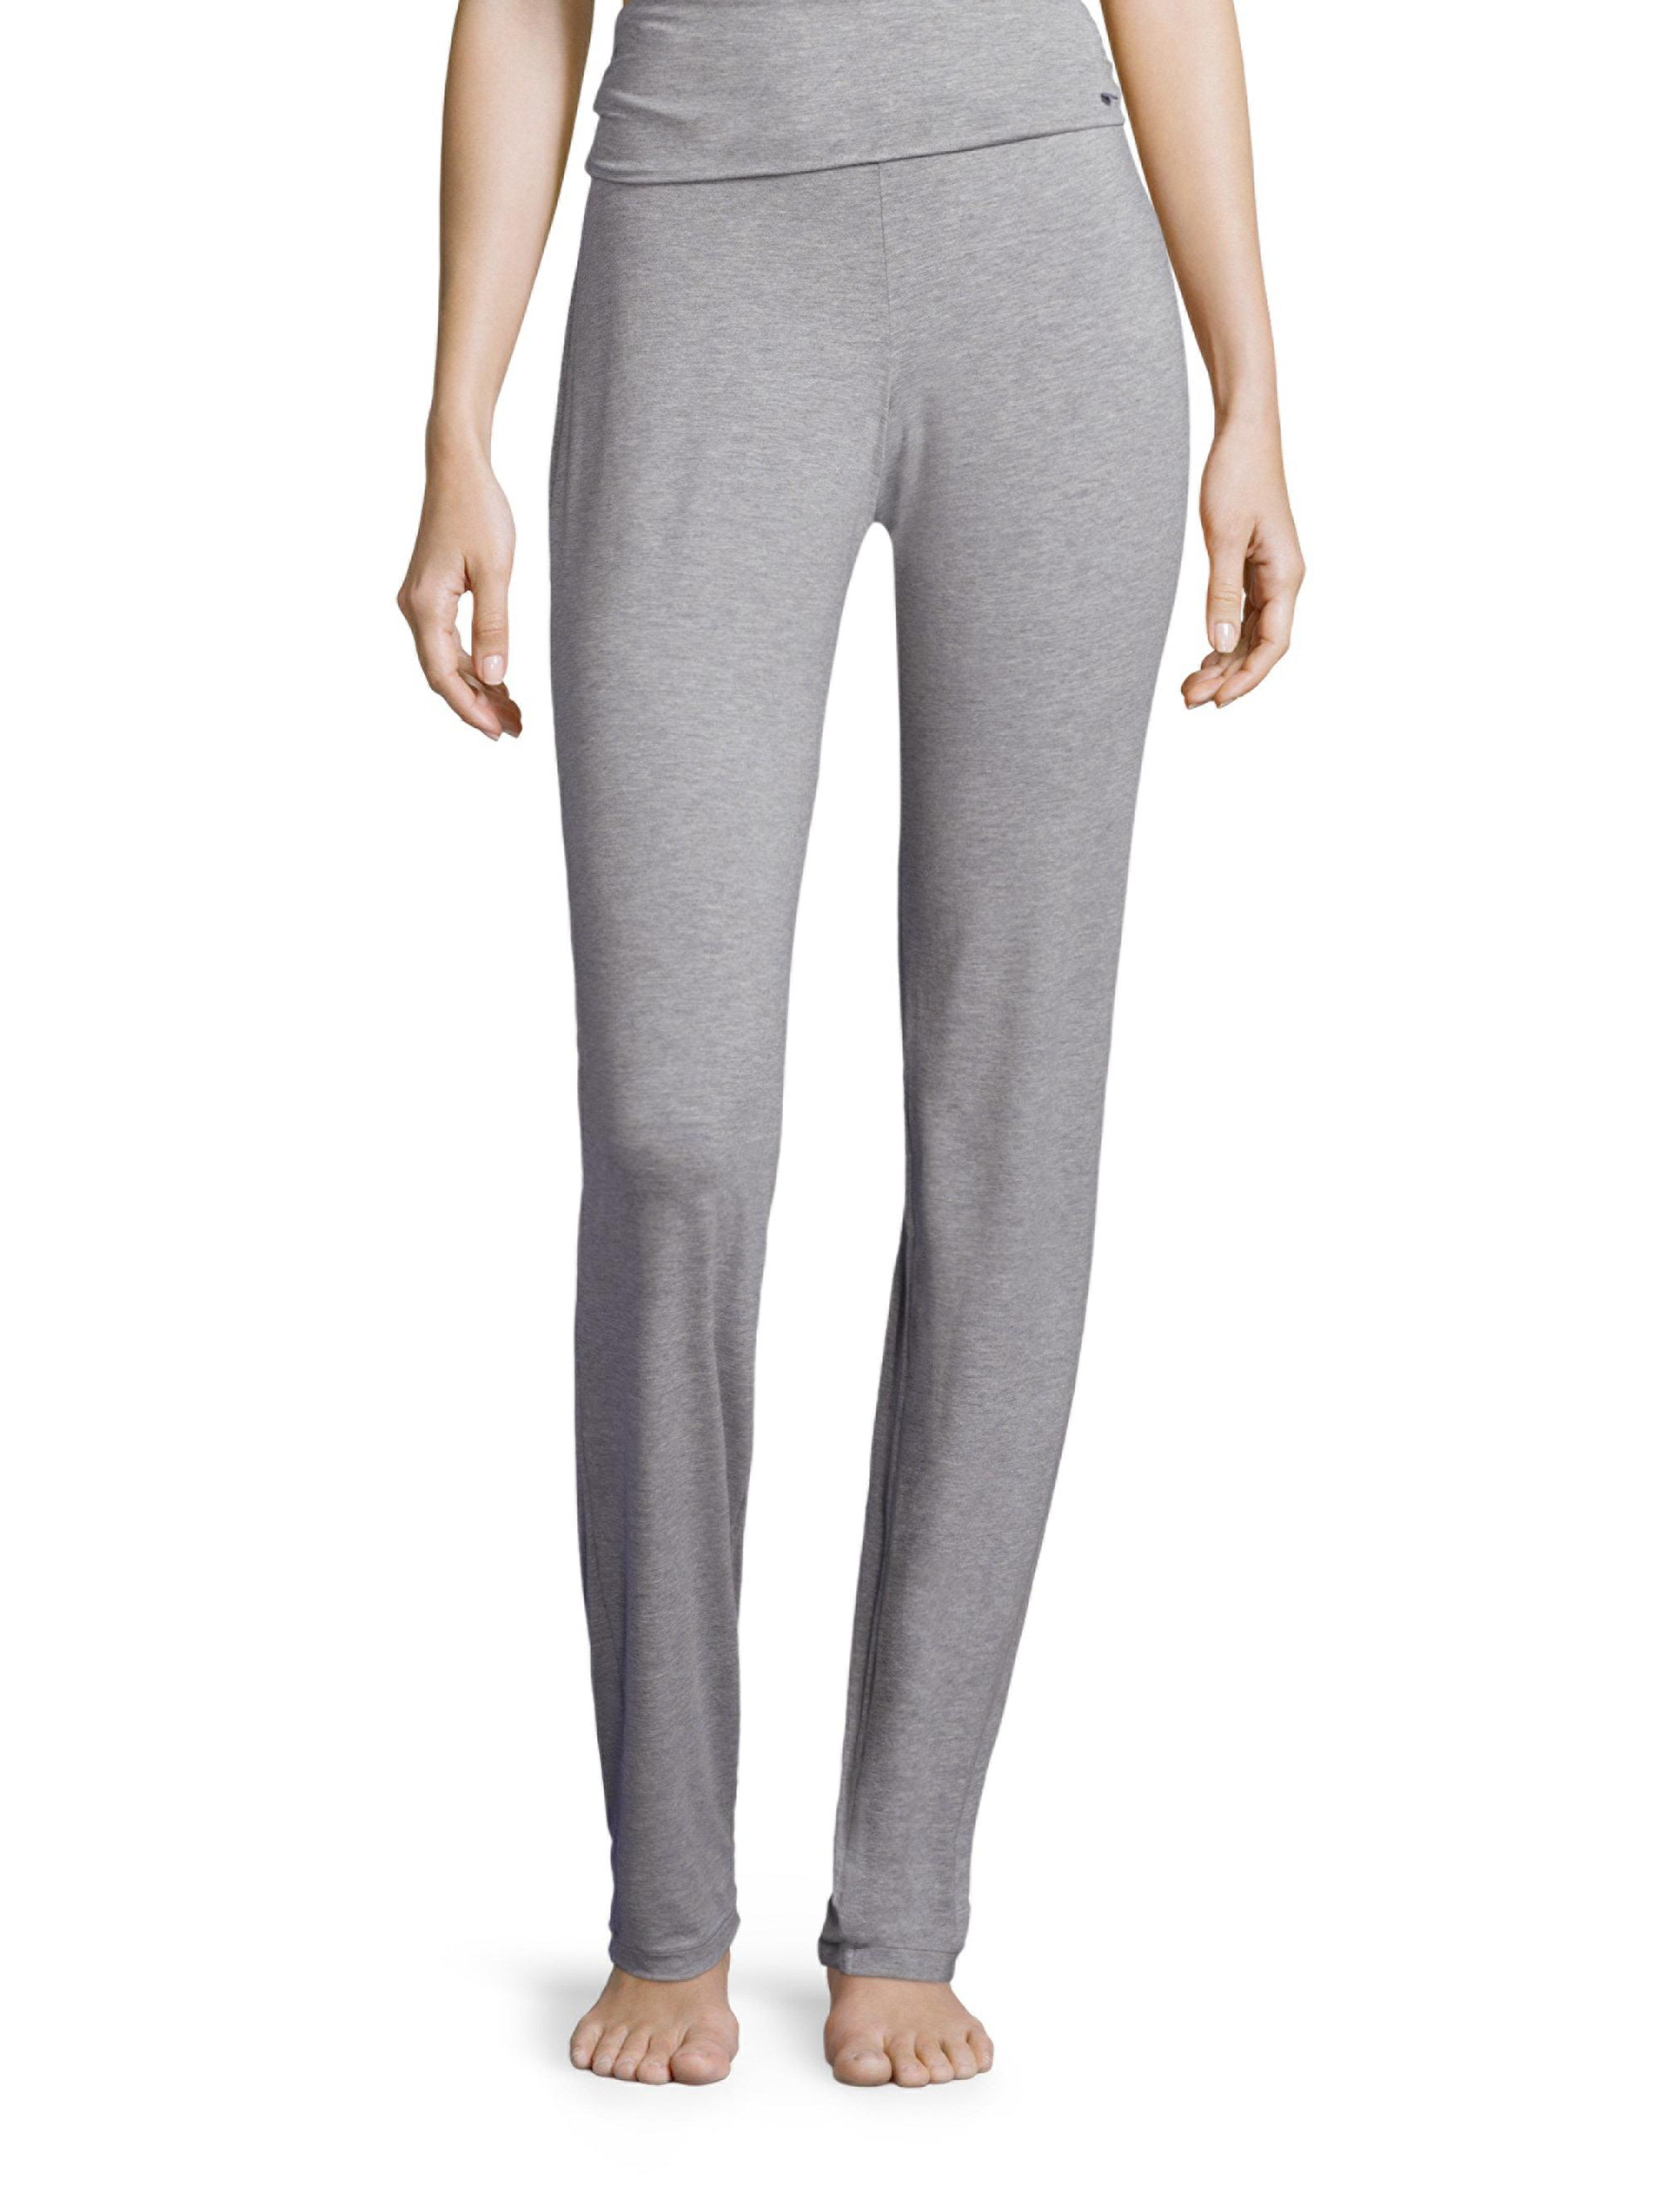 fc4bae2b1d3e3 Hanro Yoga Lounge Pants in Gray - Lyst